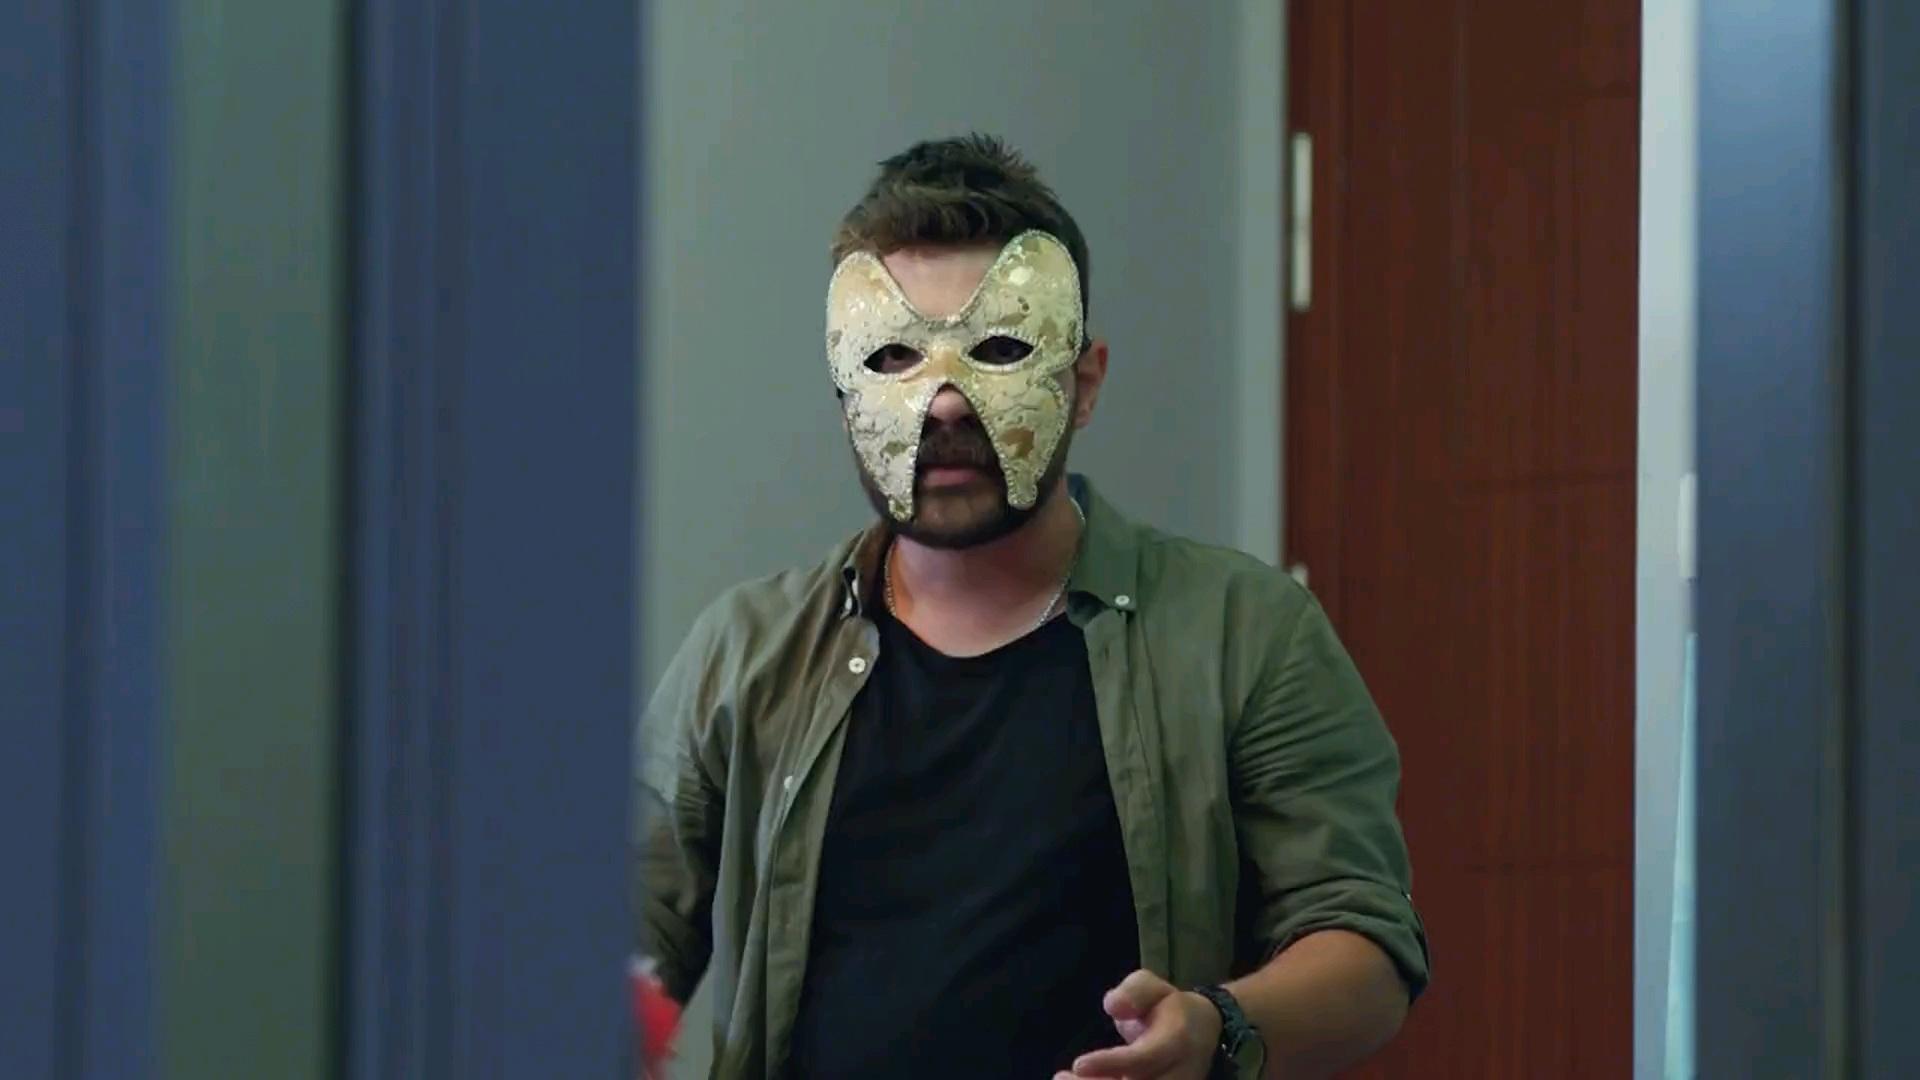 Borç Harç | 2019 | Yerli Film | NF | WEB-DL | XviD | Sansürsüz | 1080p - m720p - m1080p | WEB-DL | Tek Link